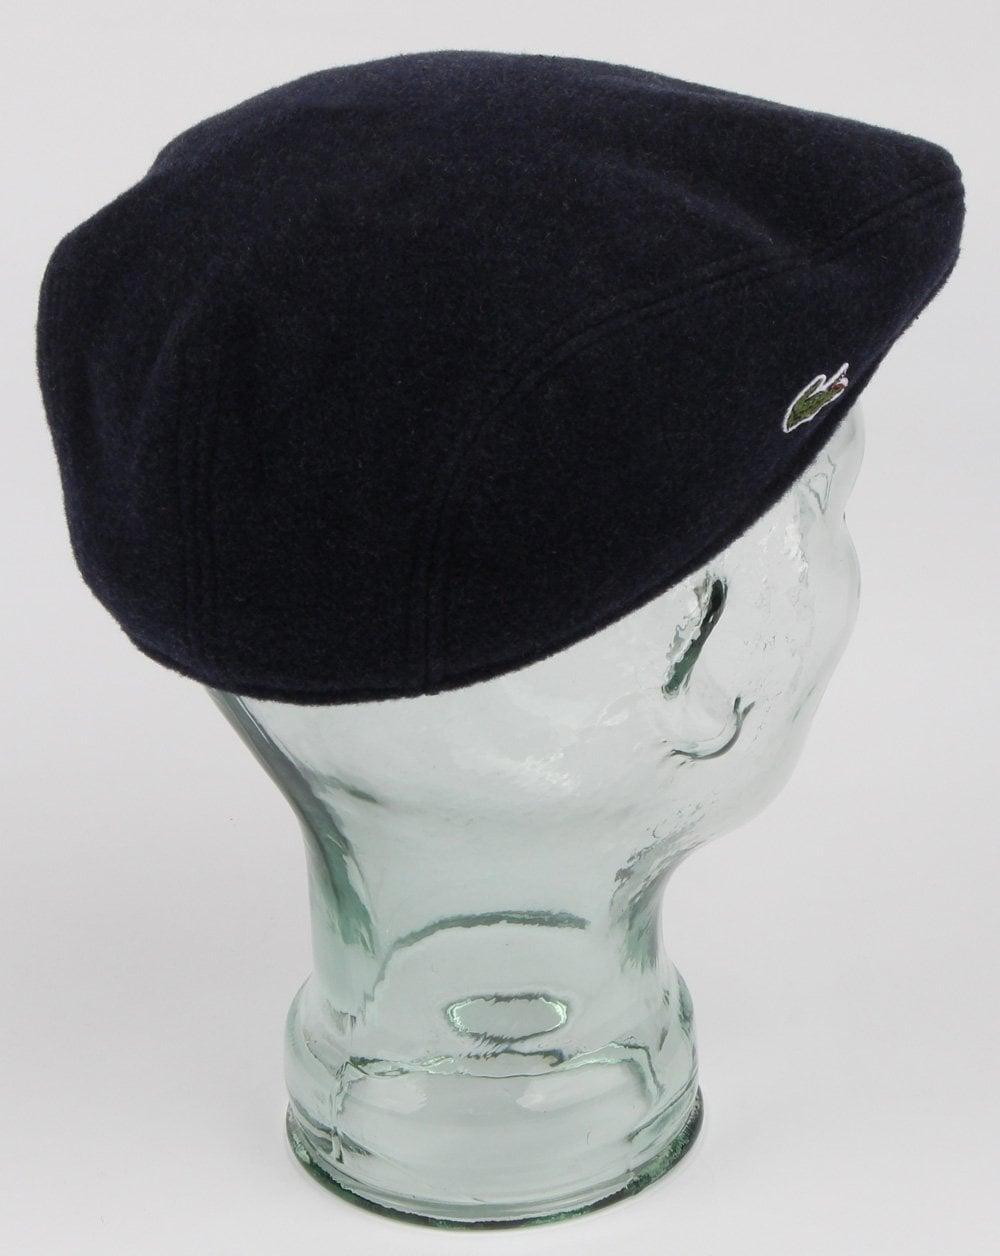 791d7d29 Lacoste Wool Broadcloth Flat Cap Navy